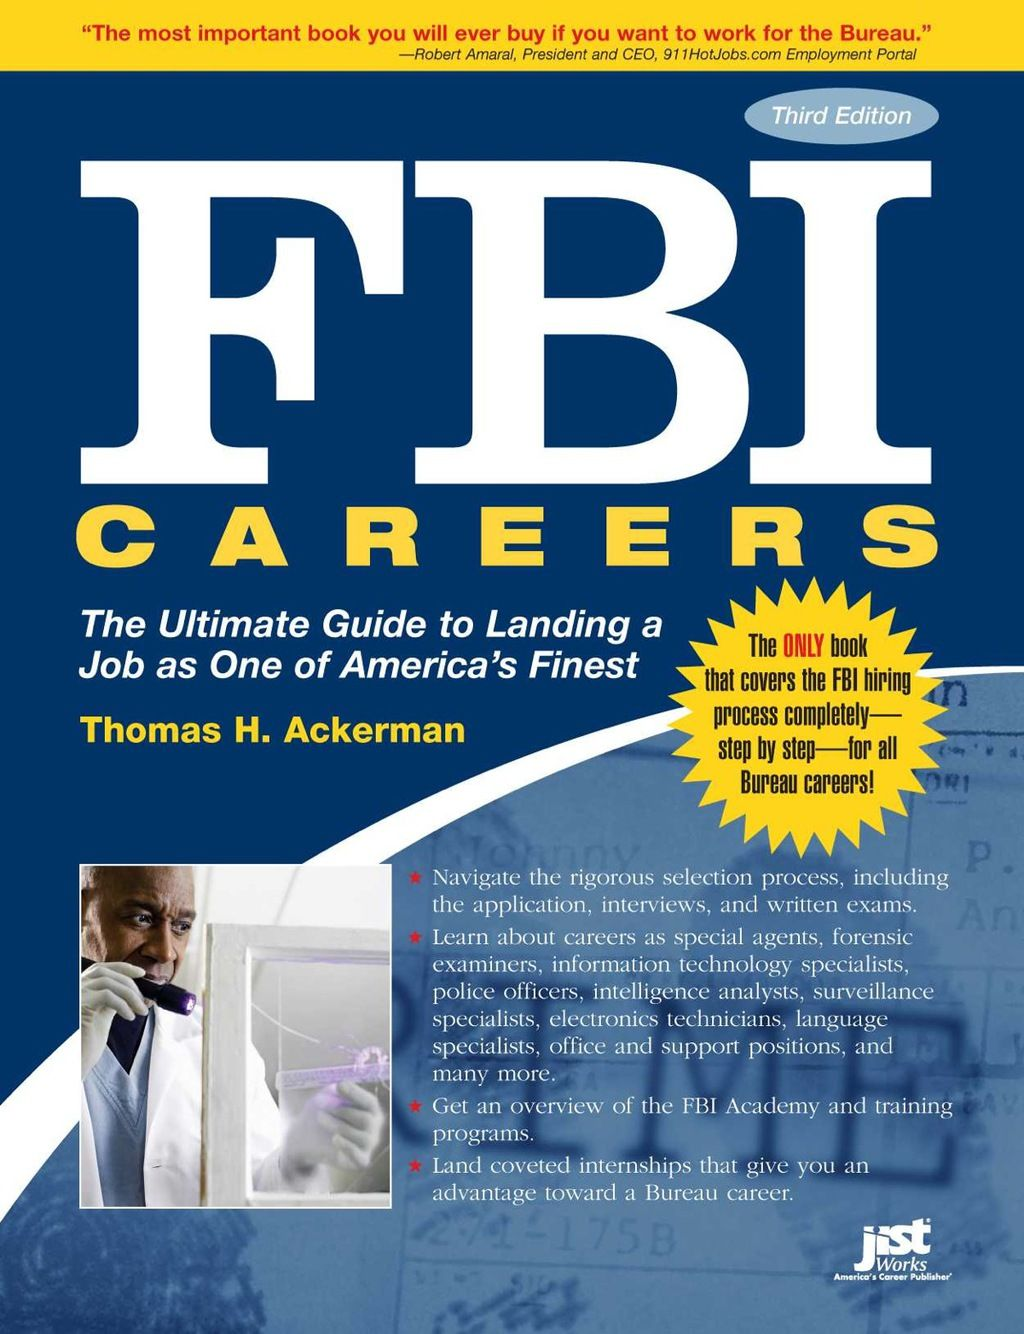 Fbi Careers Ebook Internship Program Job Career Career